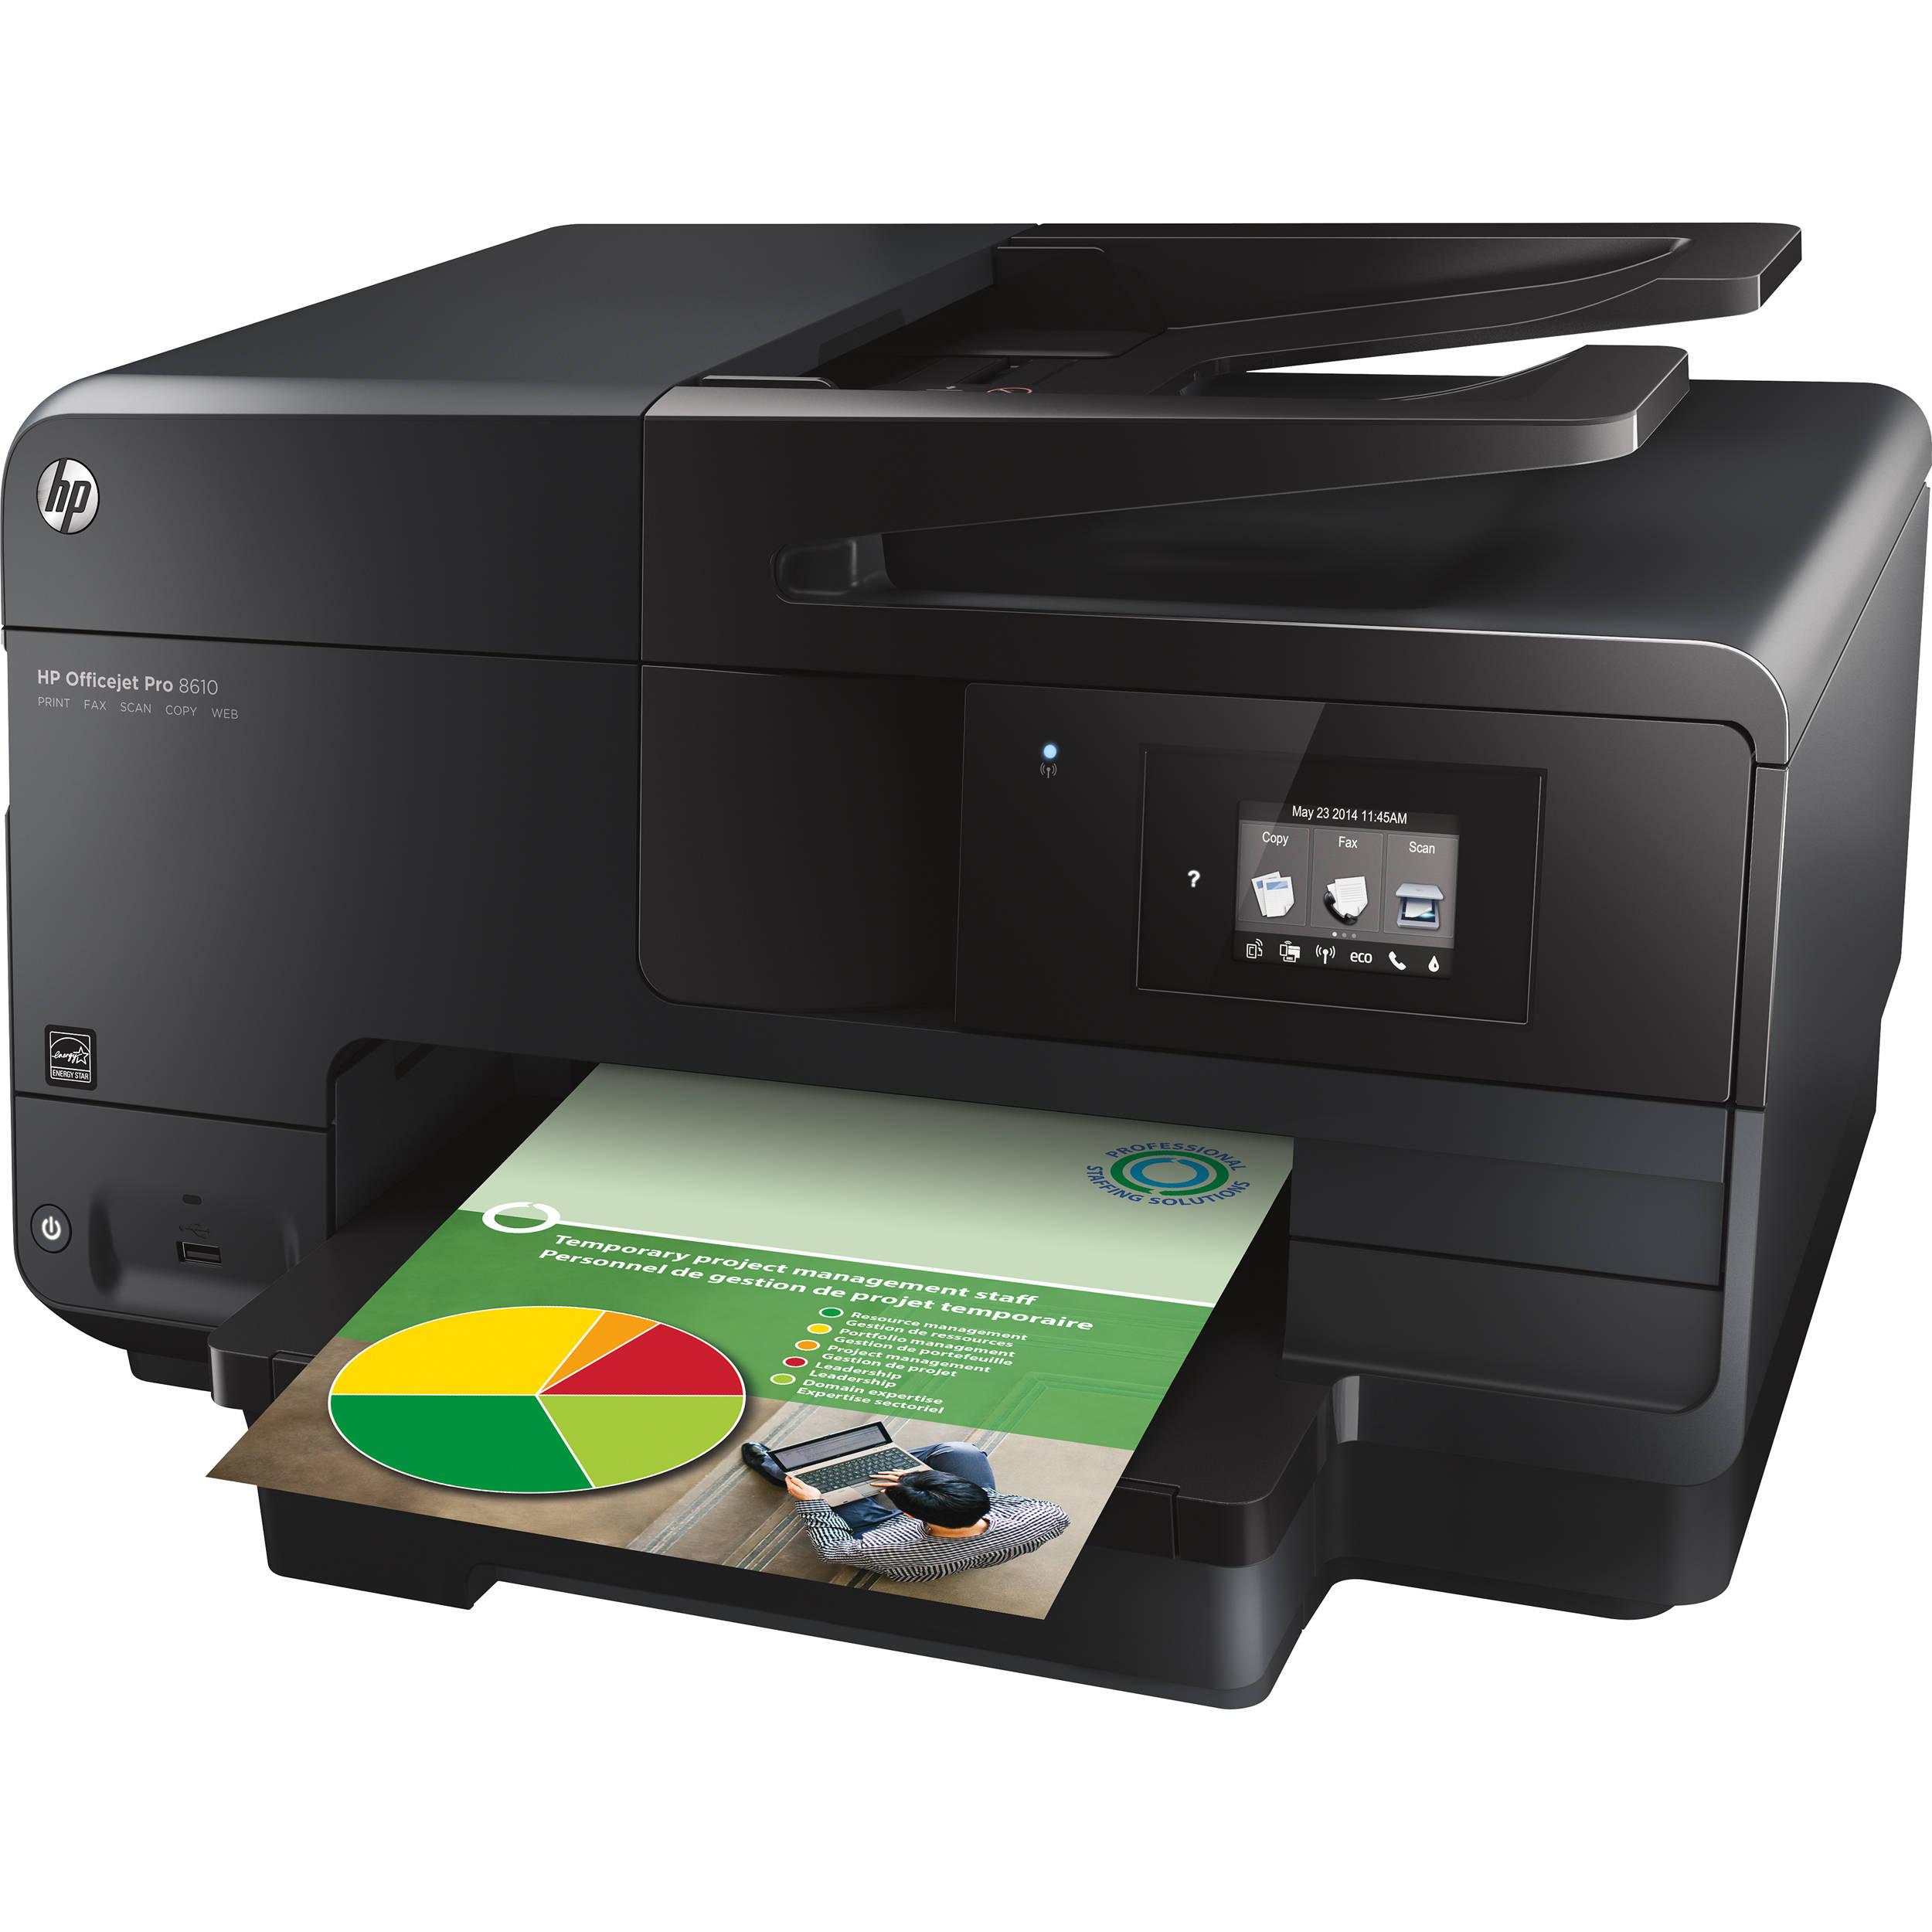 Officejet Pro 8610 e-All-in-One Wireless Color Inkjet Printer